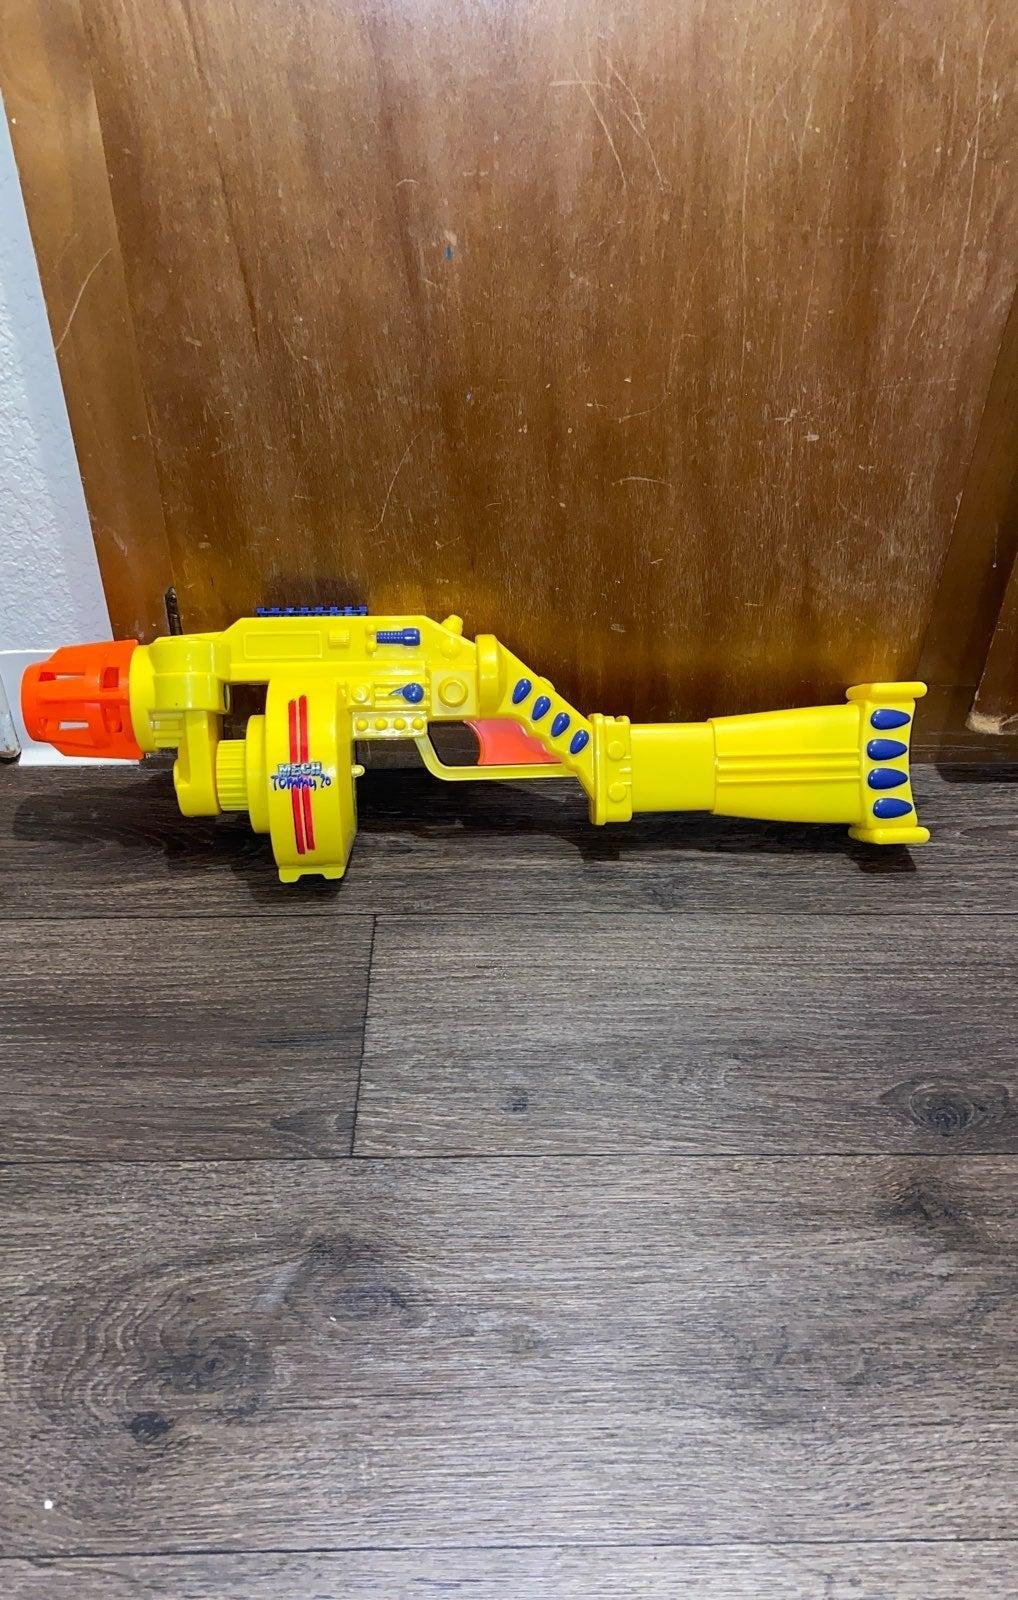 Mech Tommy 20 Blaster